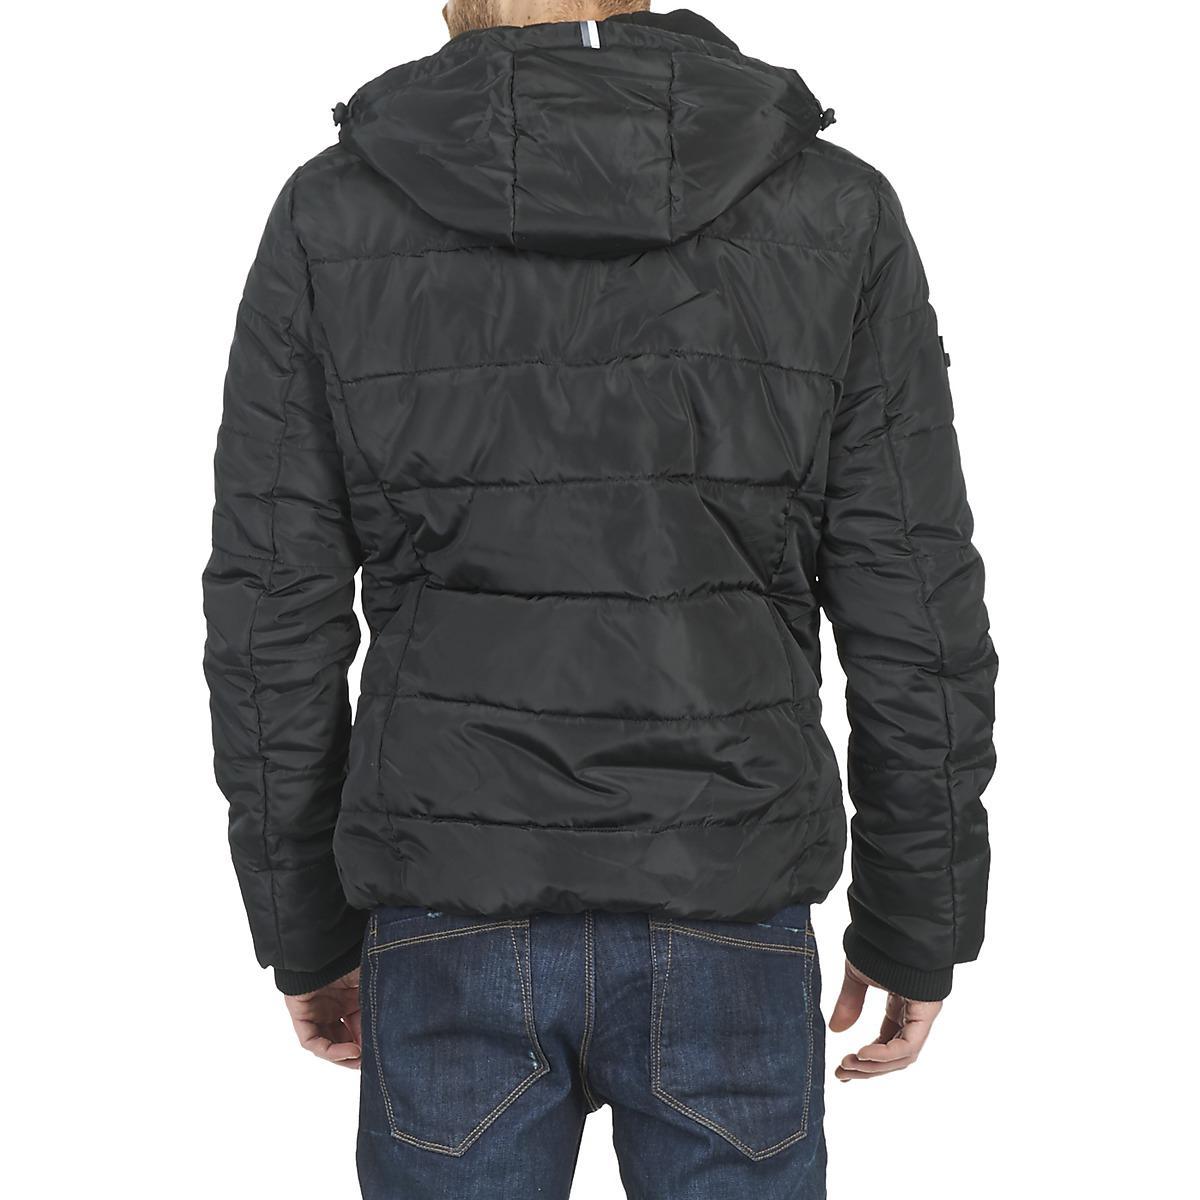 Superdry Synthetic Polar Jacket in Black for Men